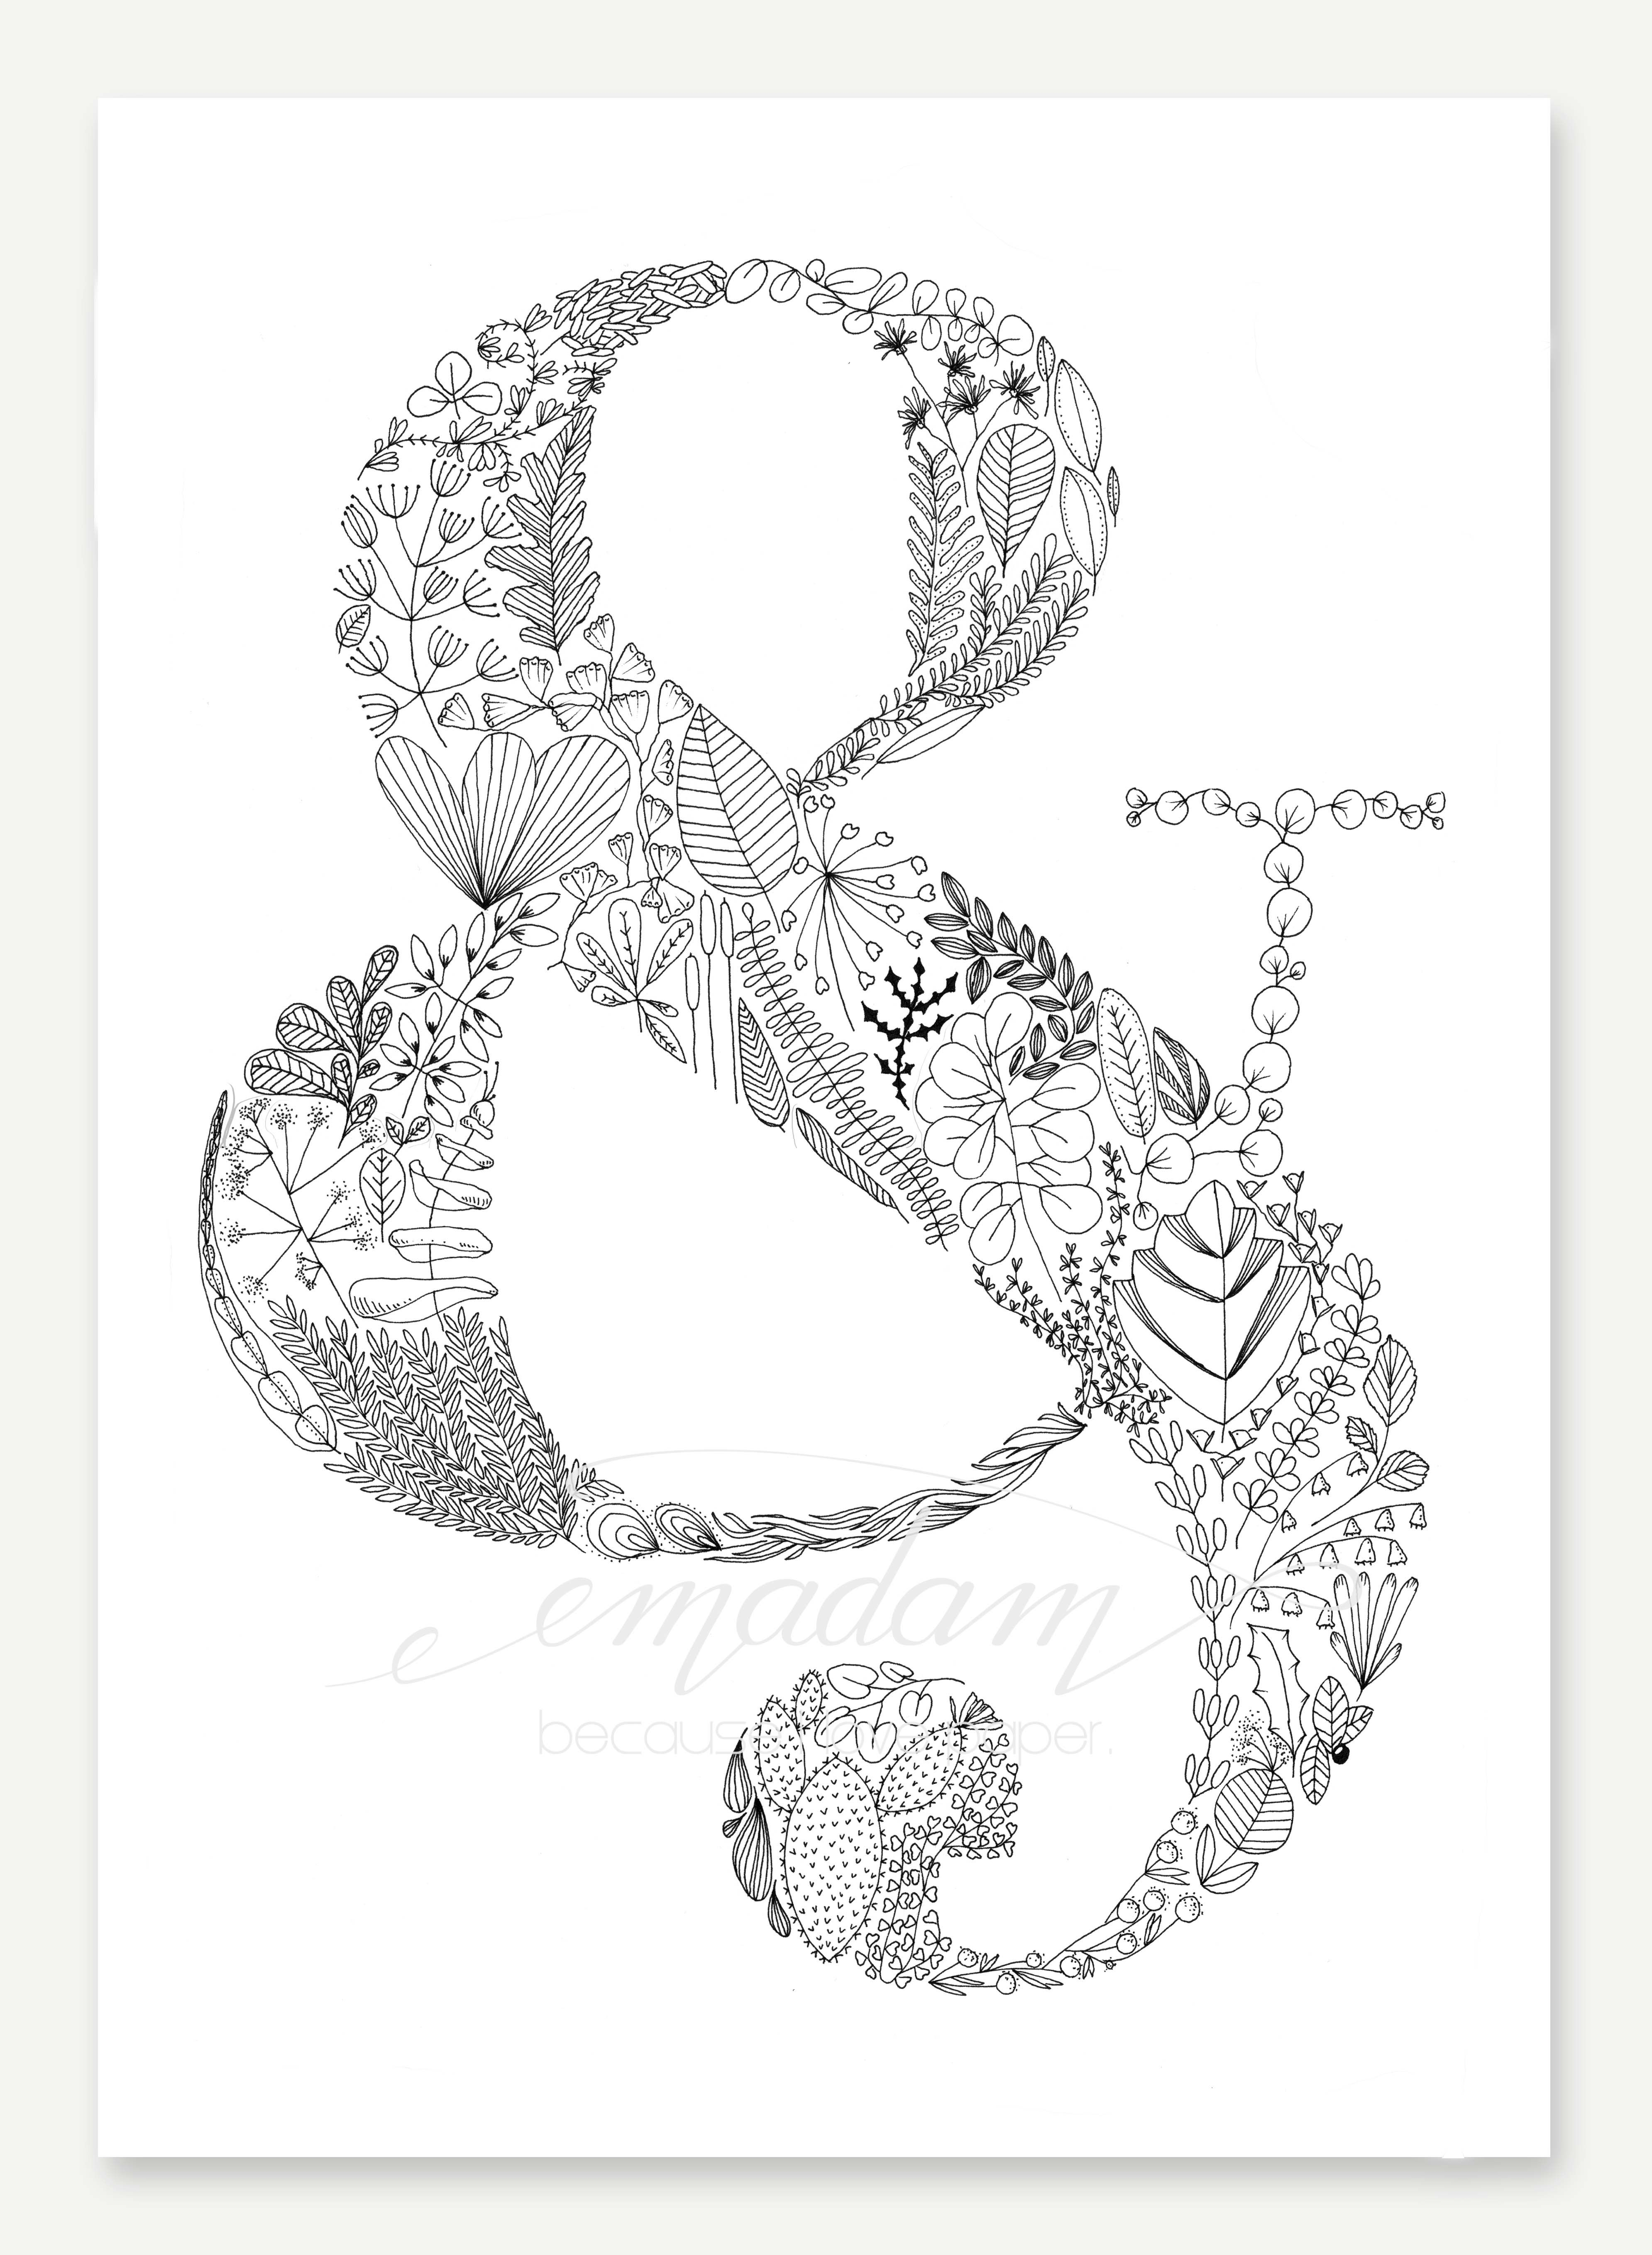 Ampersand Art Print Din A3 Aquarell Blatter Kunstdruck Und